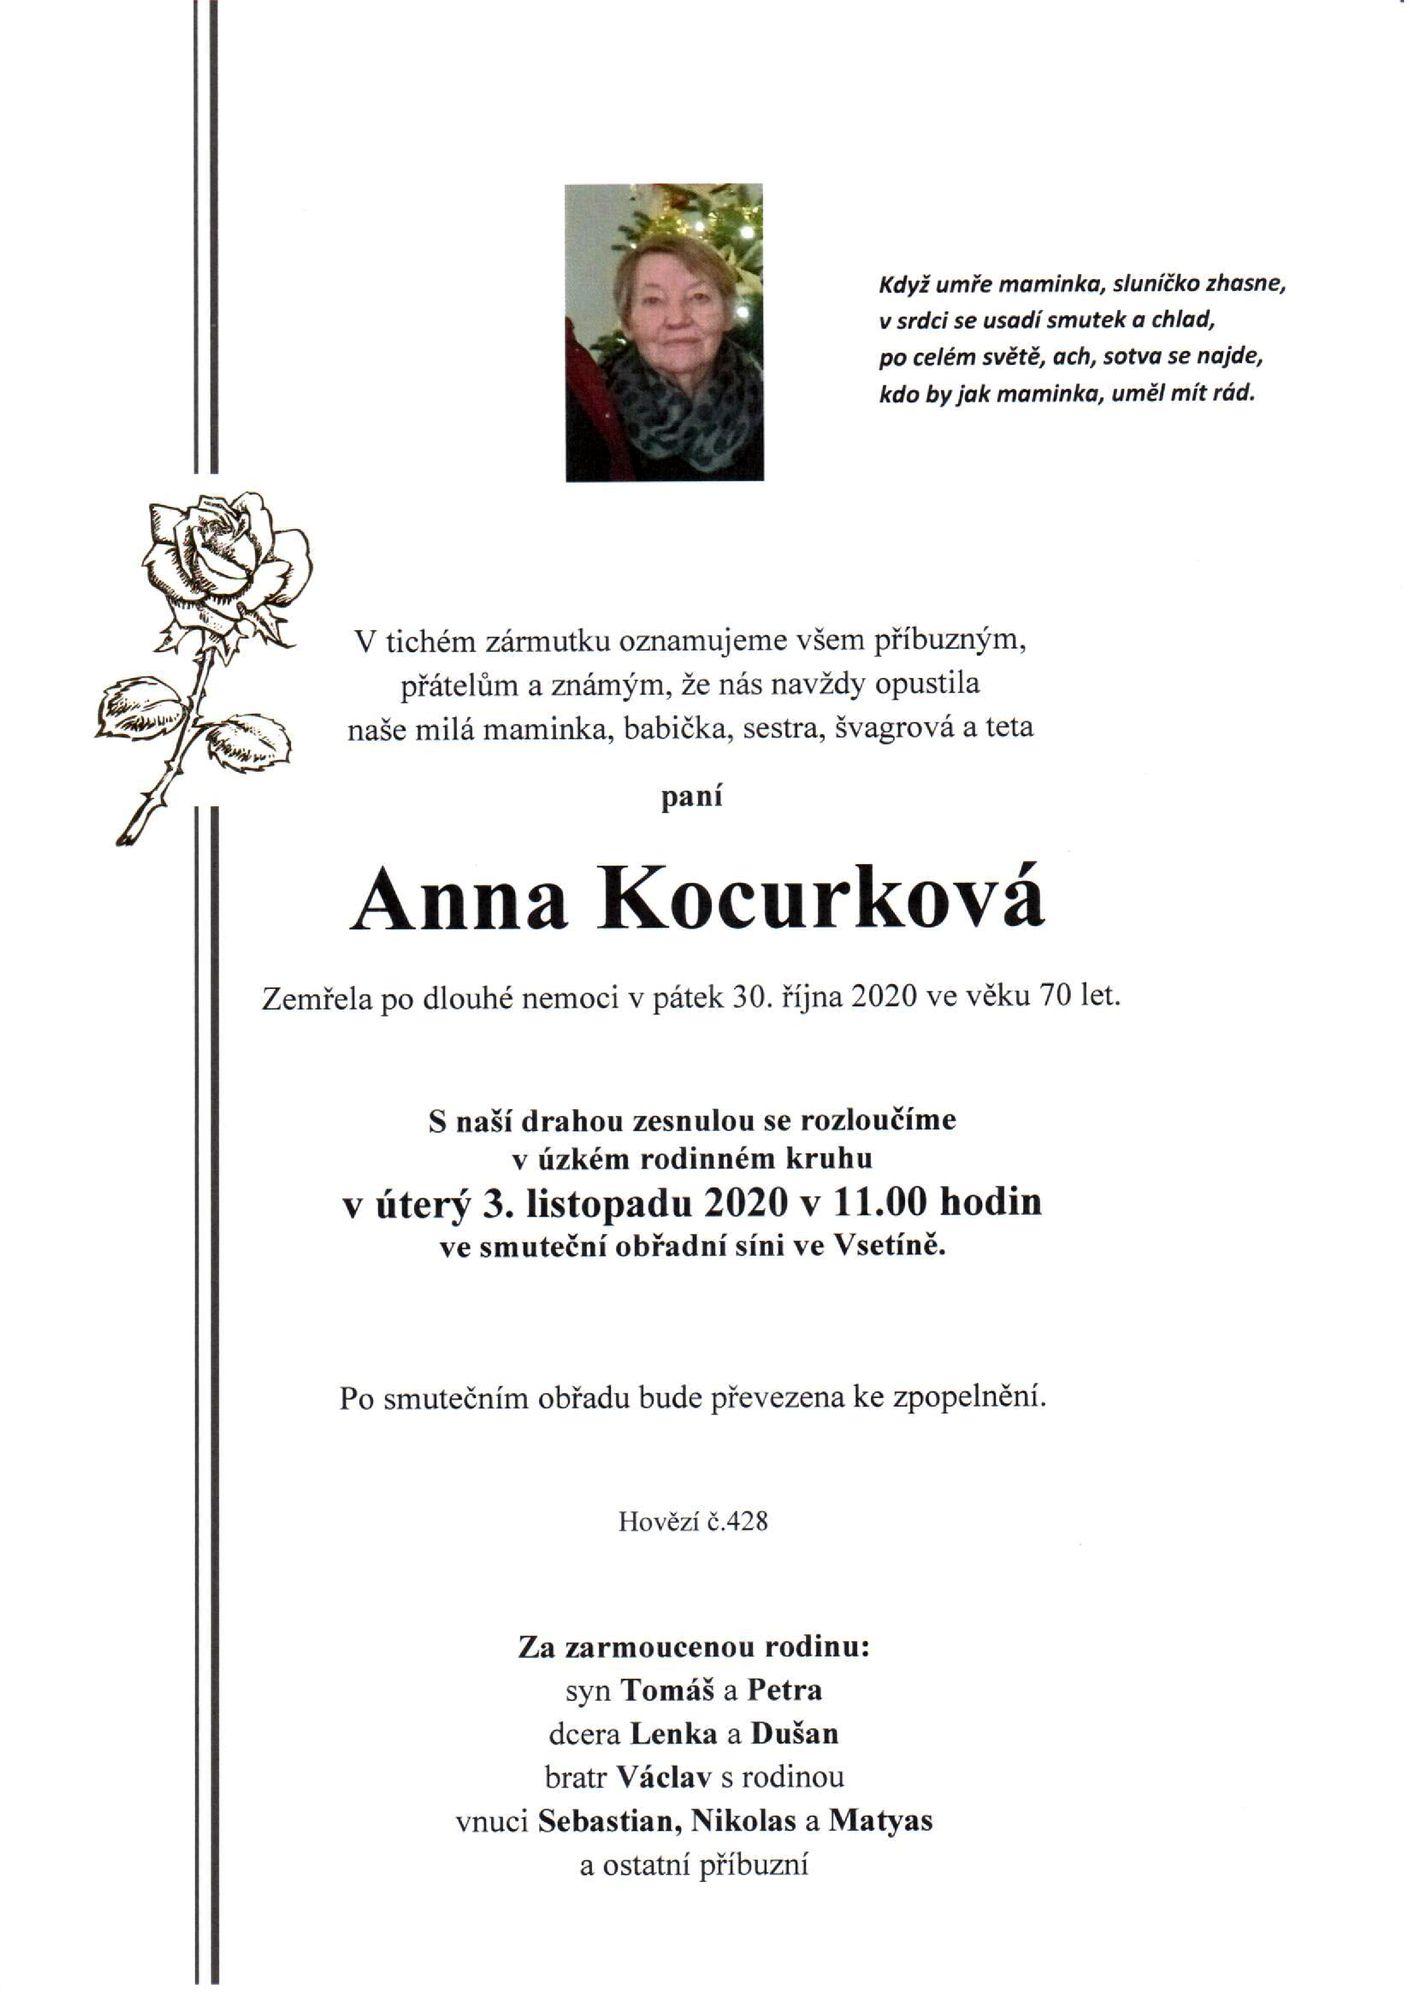 Anna Kocurková